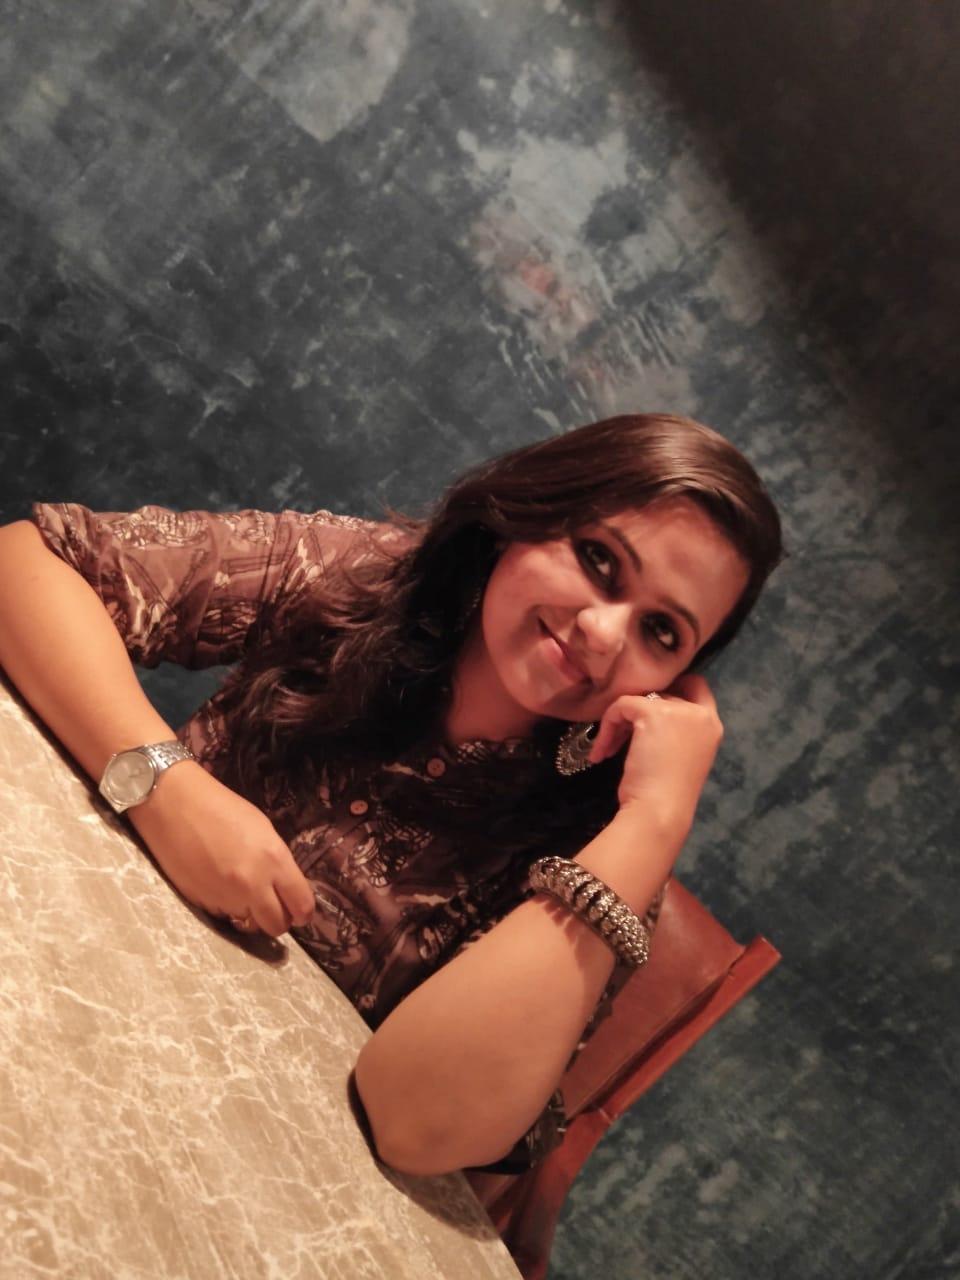 Anwesha Bhattacharyya